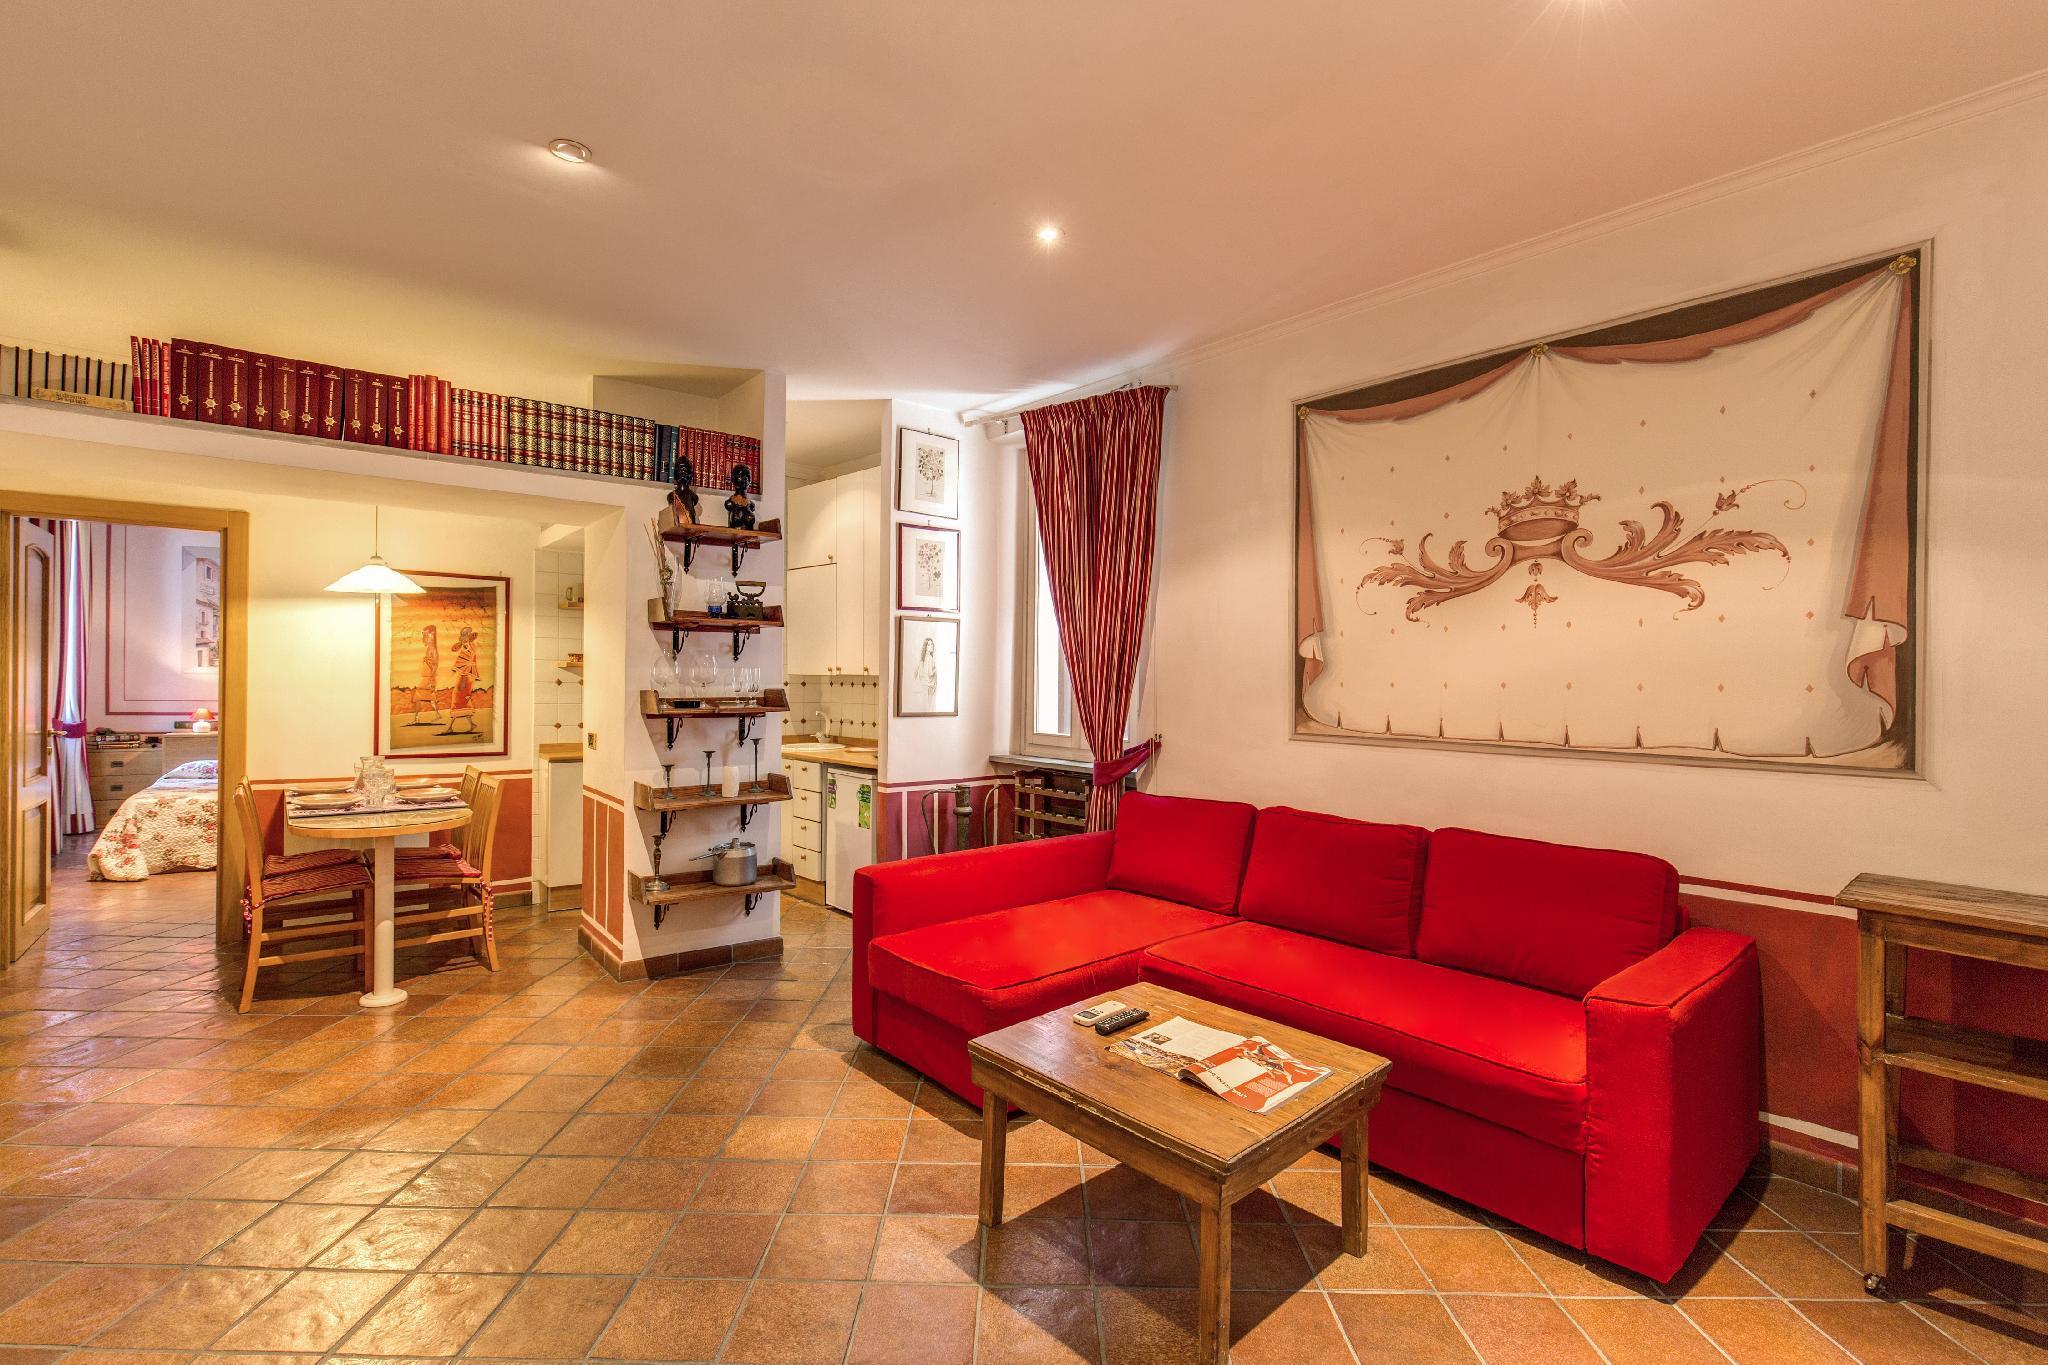 Lovely flat in Fontana di Trevi